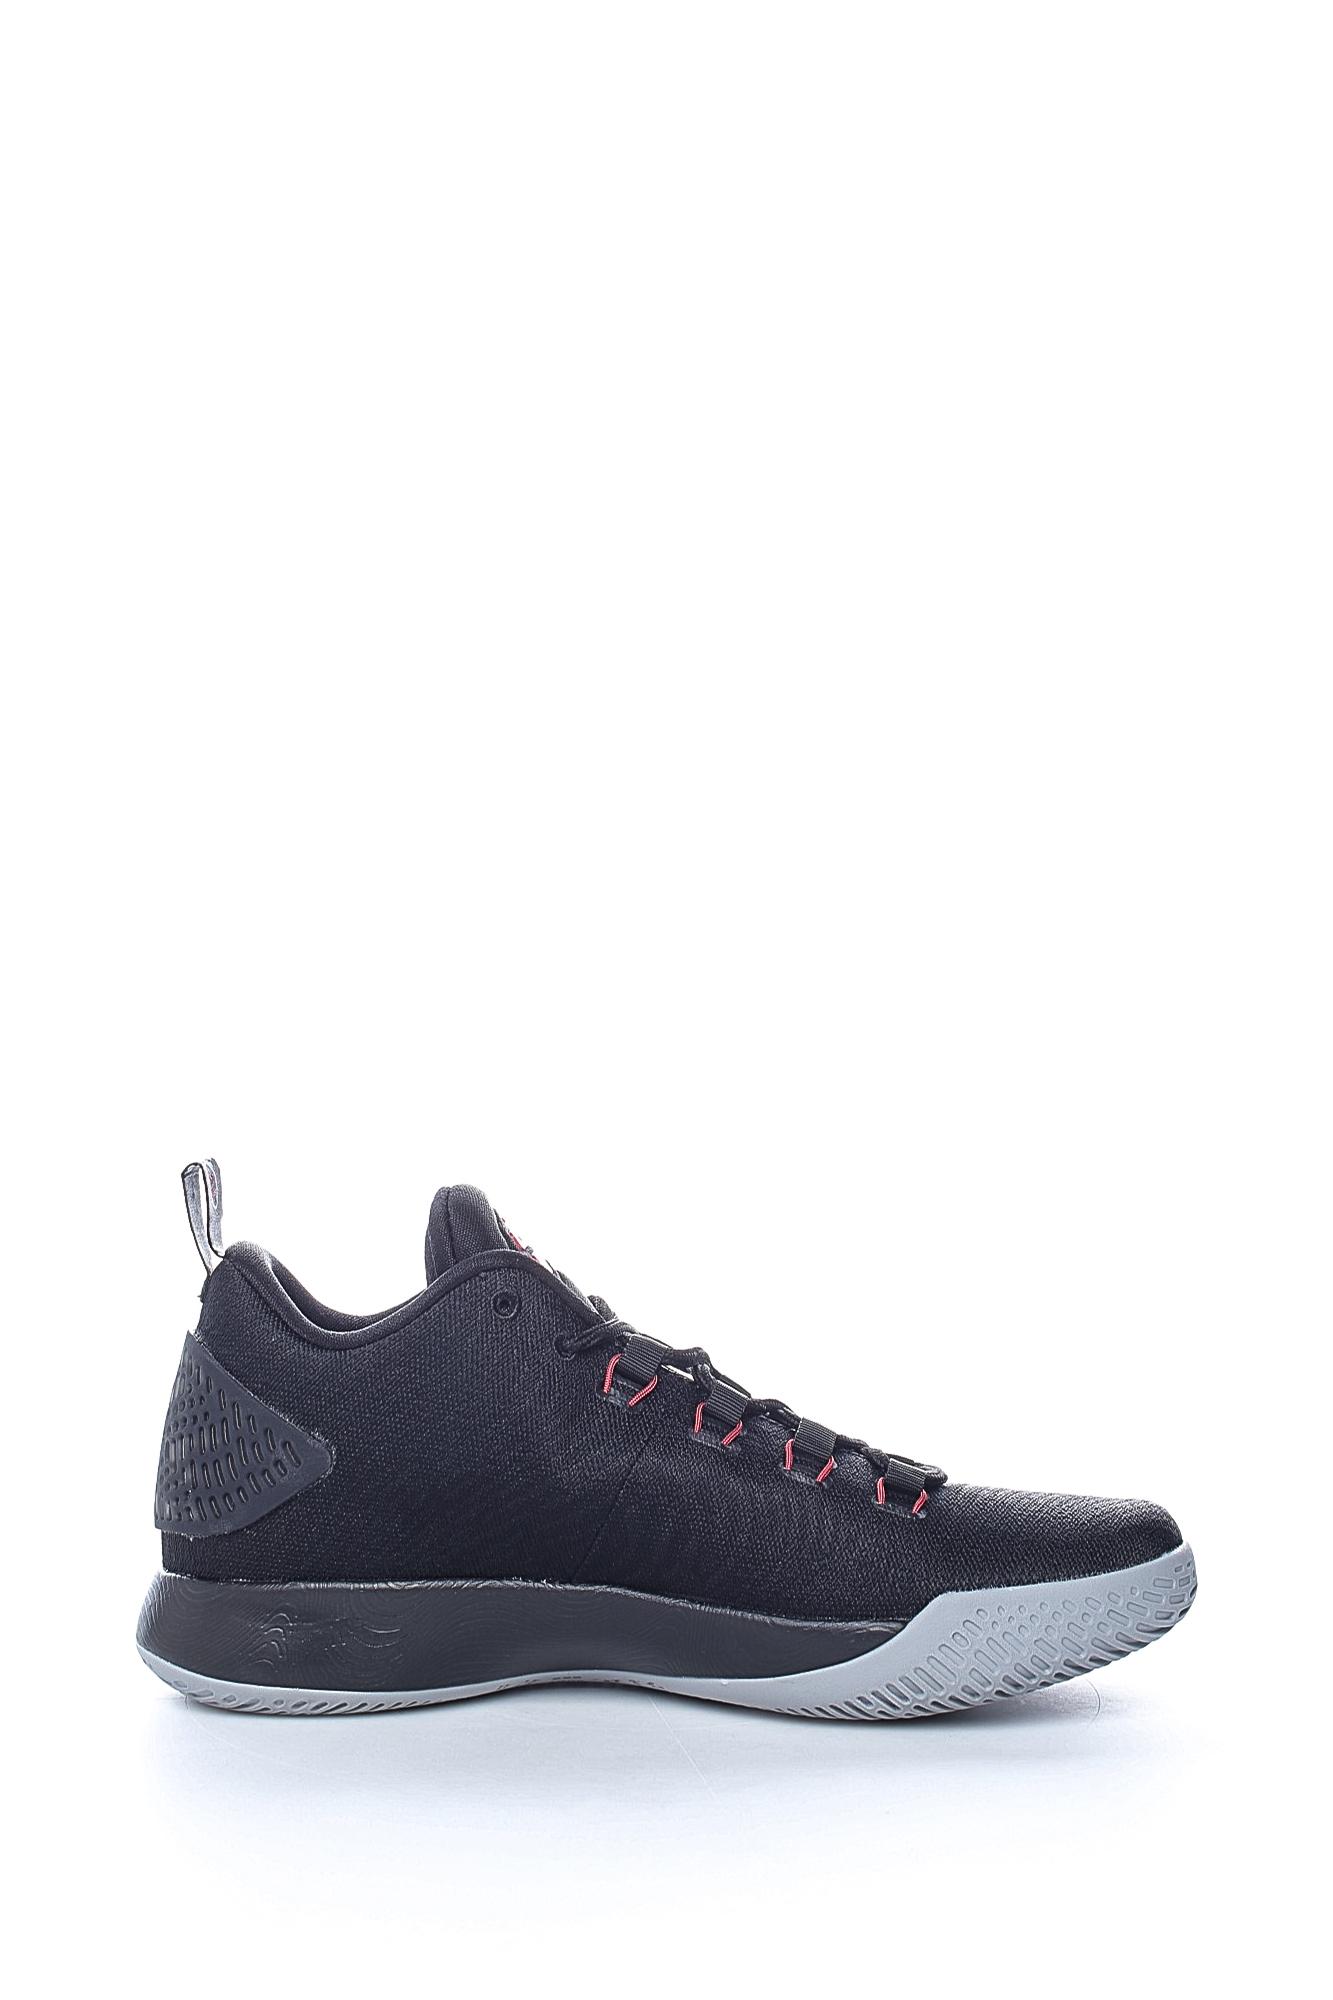 NIKE – Ανδρικά παπούτσια μπάσκετ Nike JORDAN CP3.X μαύρα